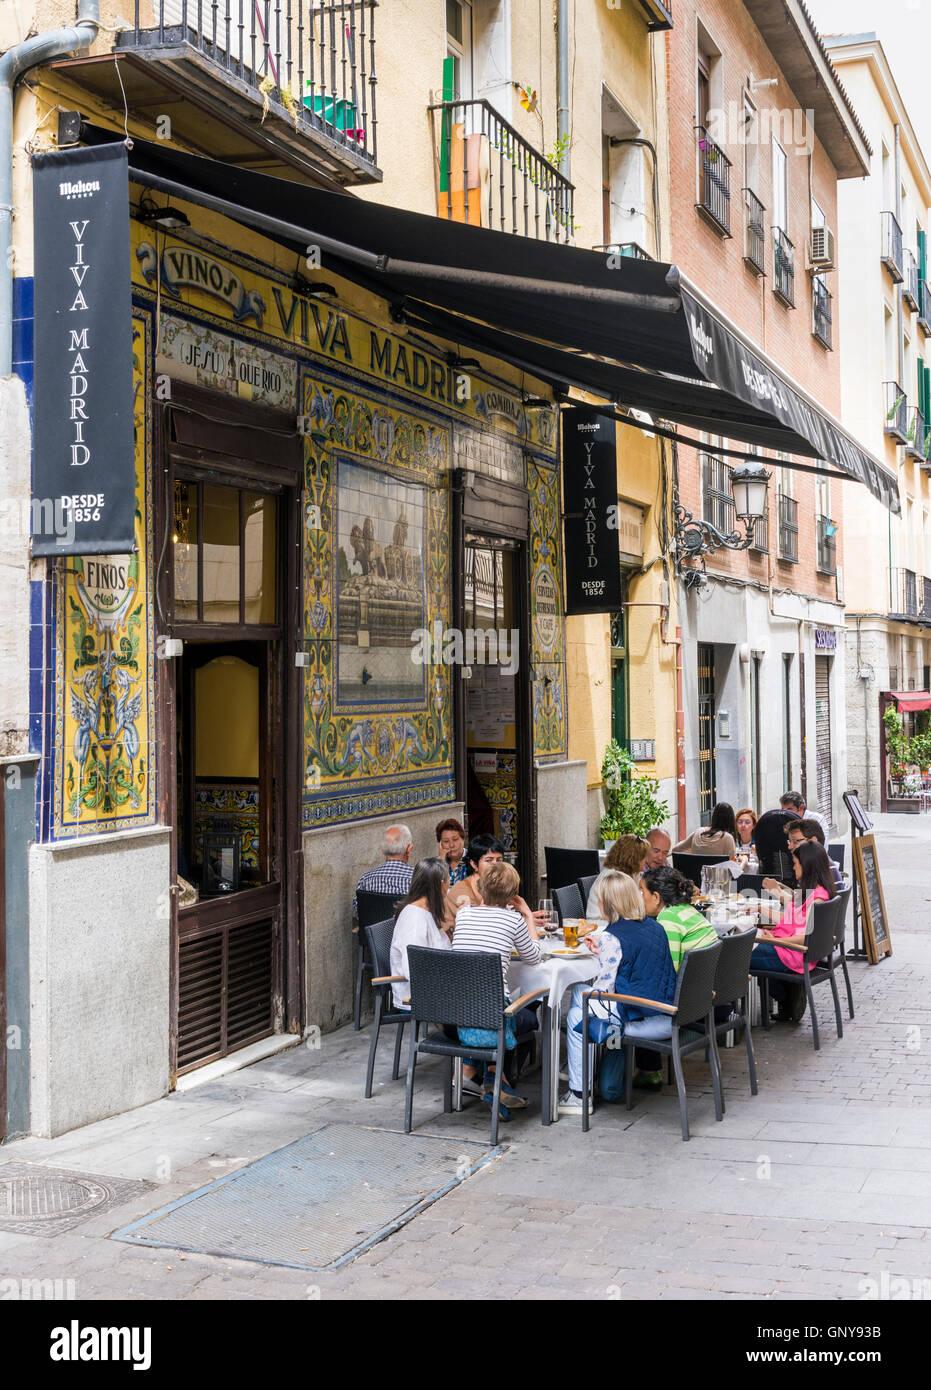 People seated outside the historic Viva Madrid restaurant in the Huertas district, Madrid, Spain - Stock Image